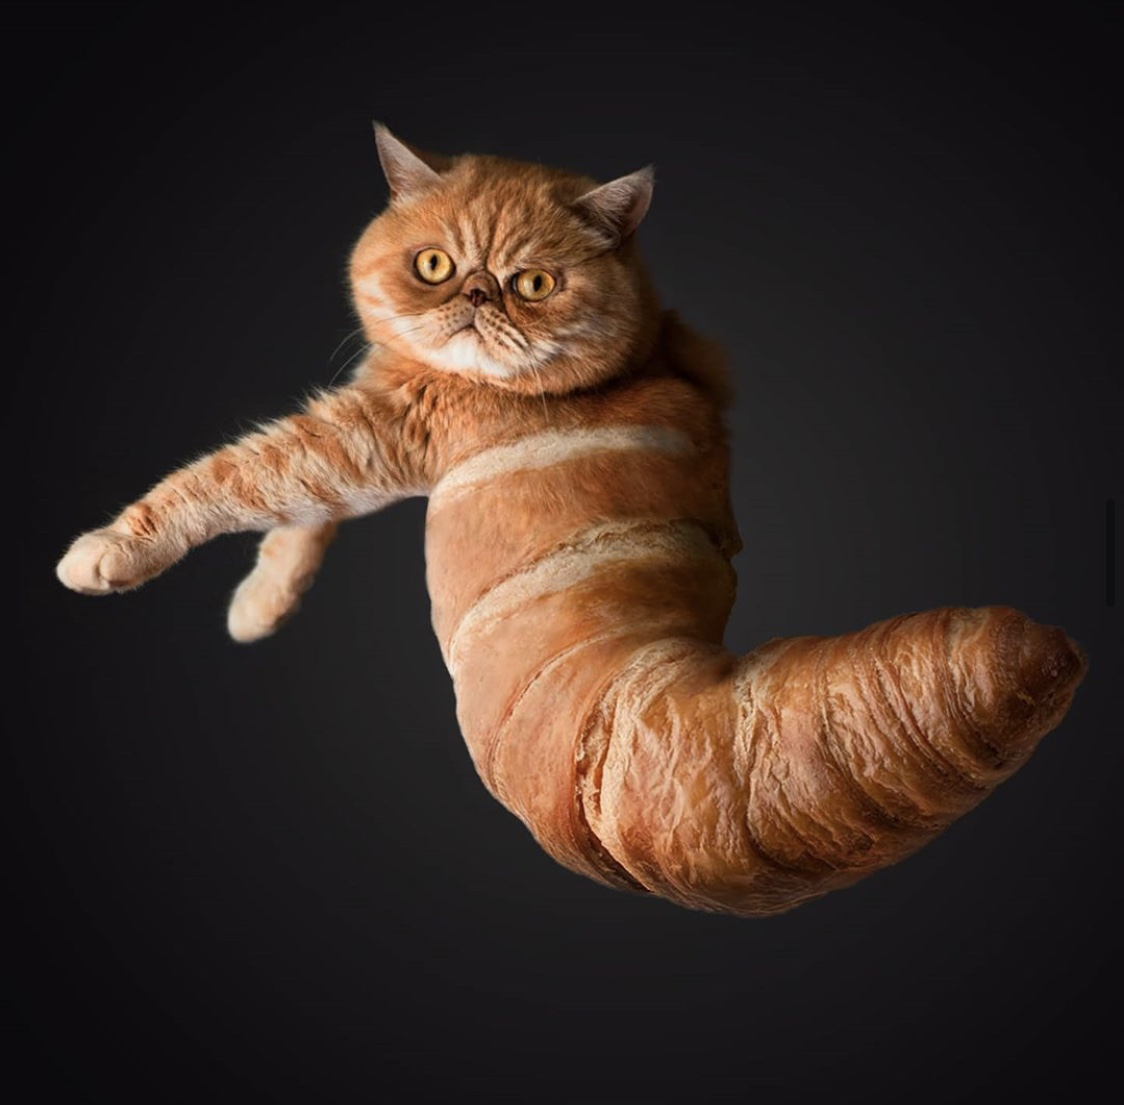 animalsinthings - Fotokollagen mit Tieren